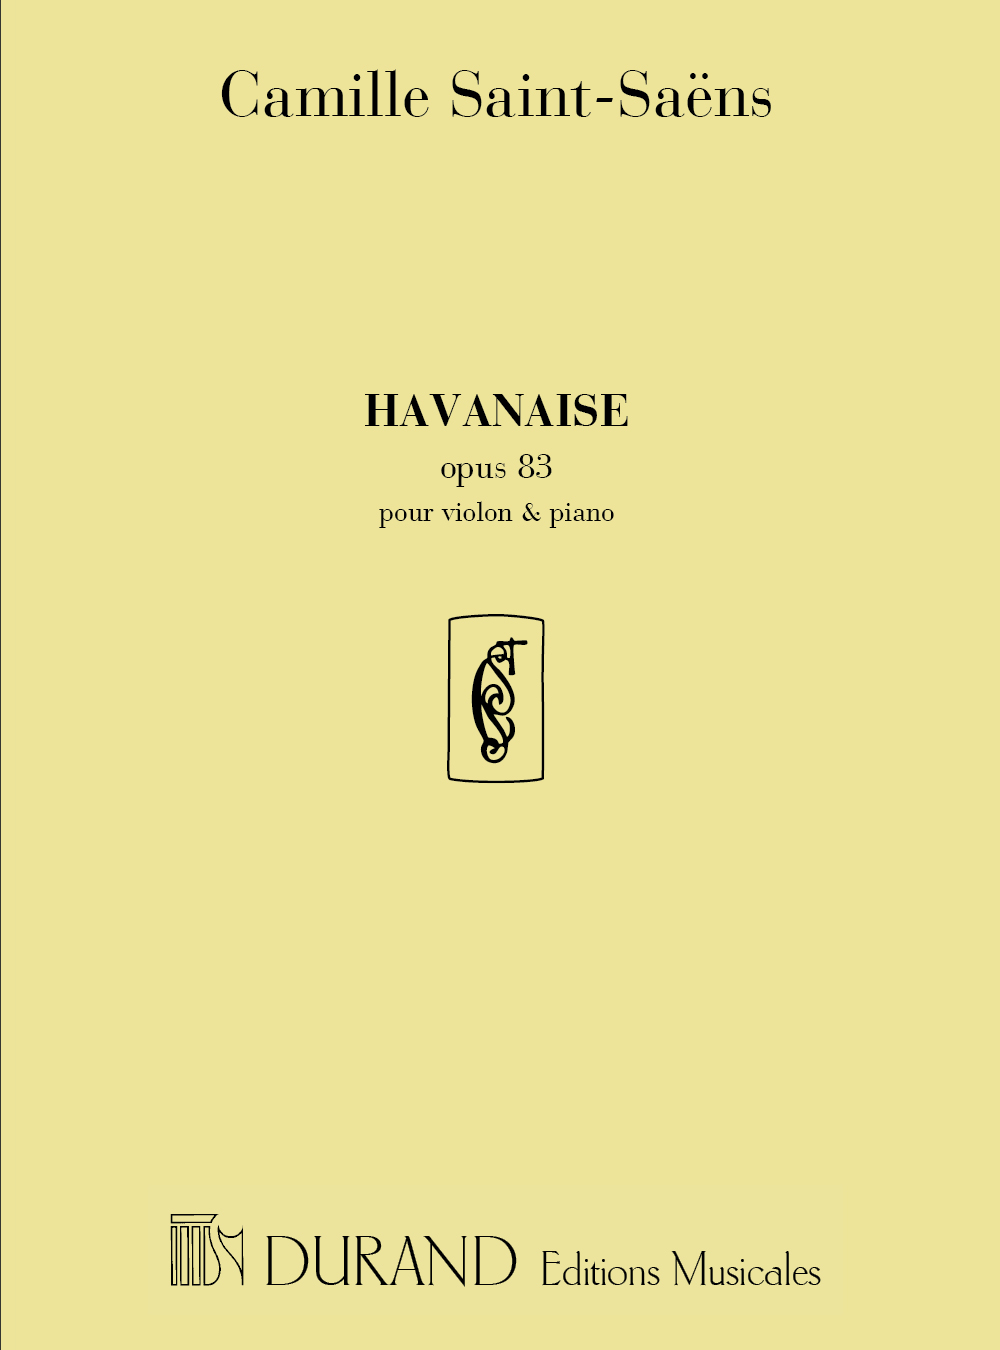 Camille Saint-Saëns: Havanaise Op 83: Violin